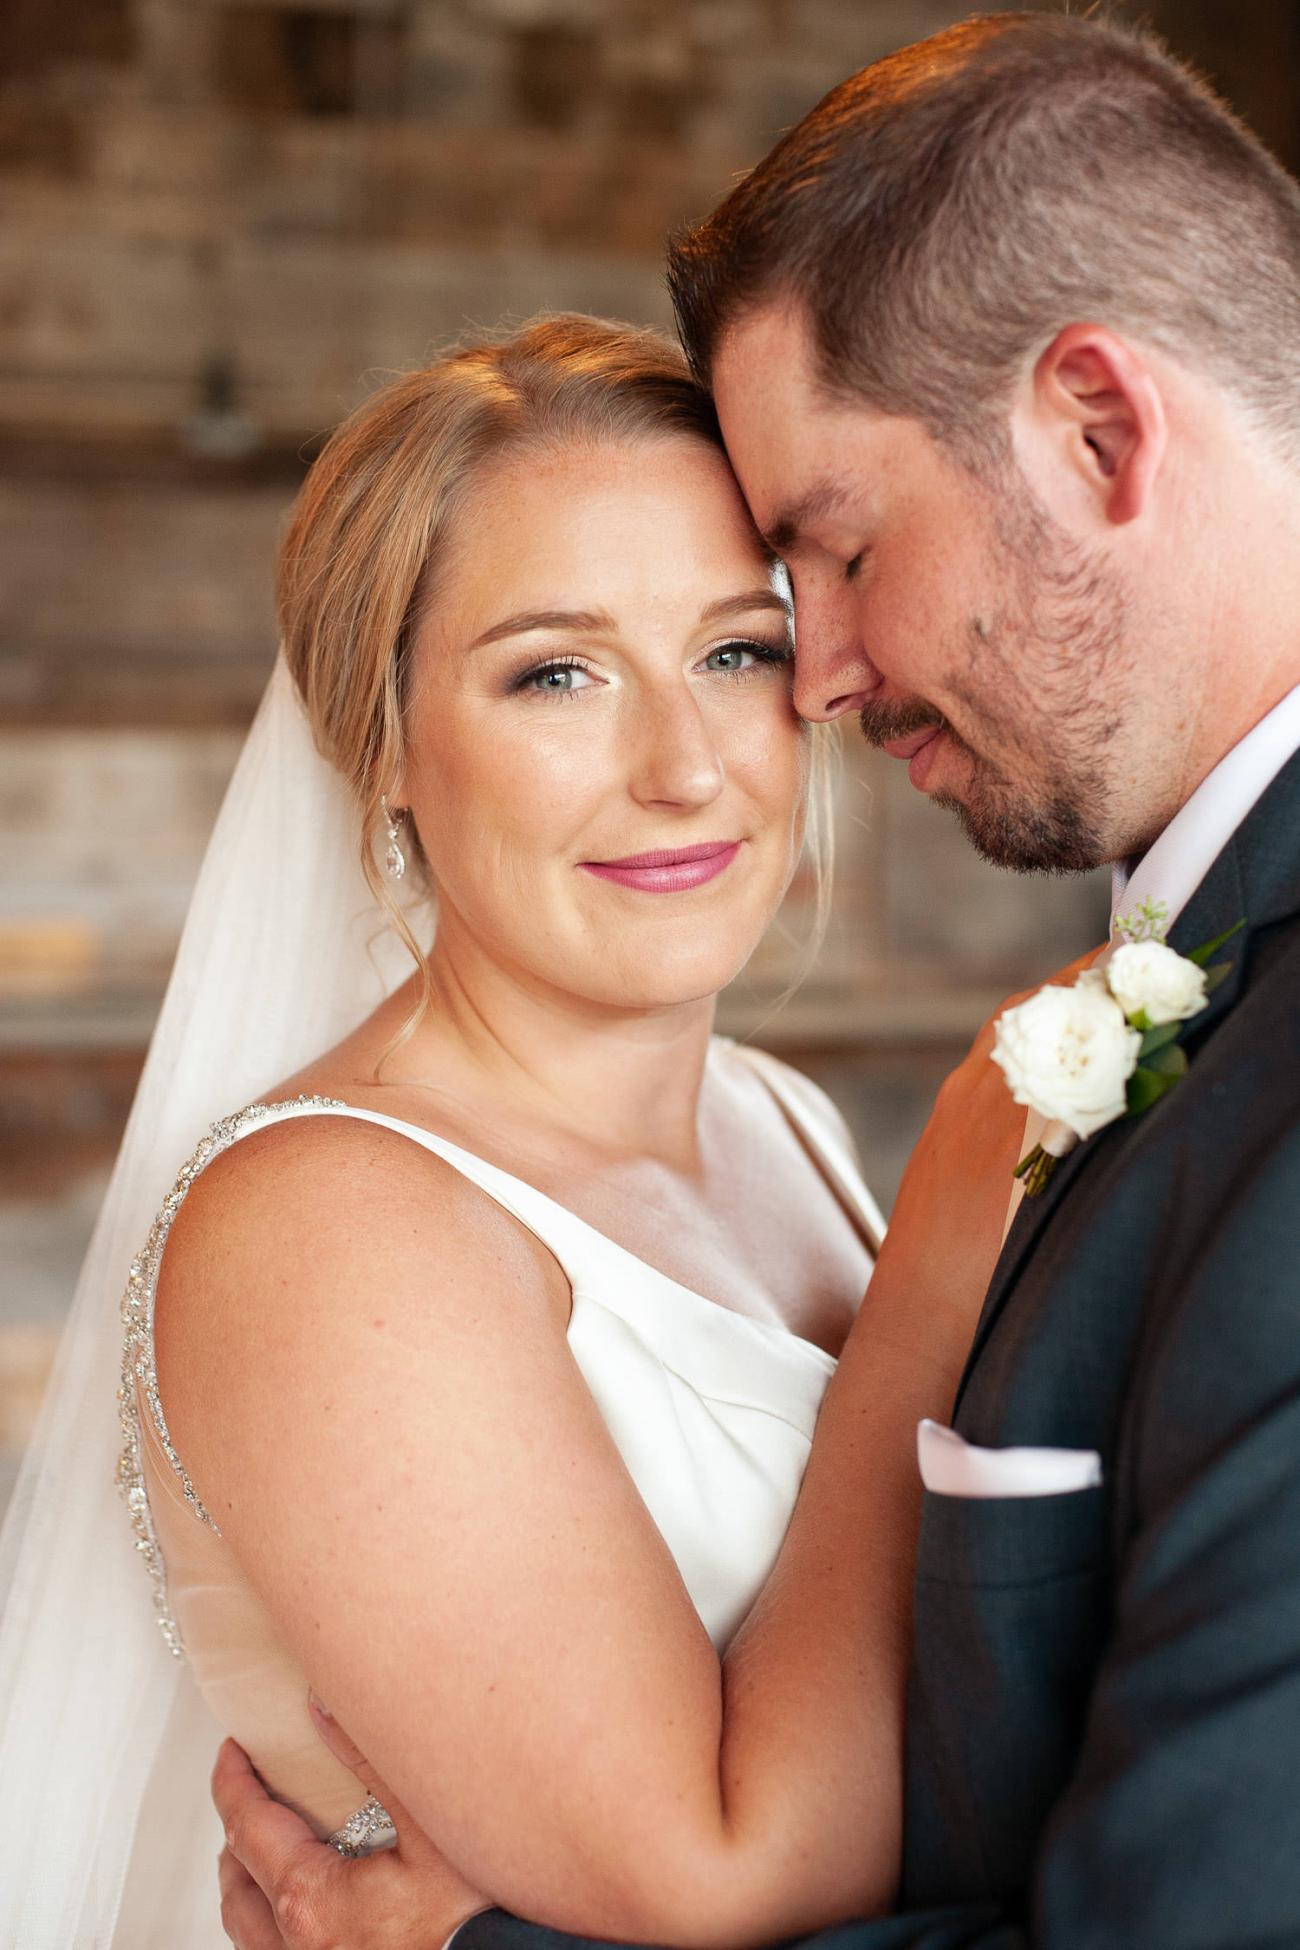 Bridal portrait at Creekside Villa wedding captured by Tara Whittaker Photography